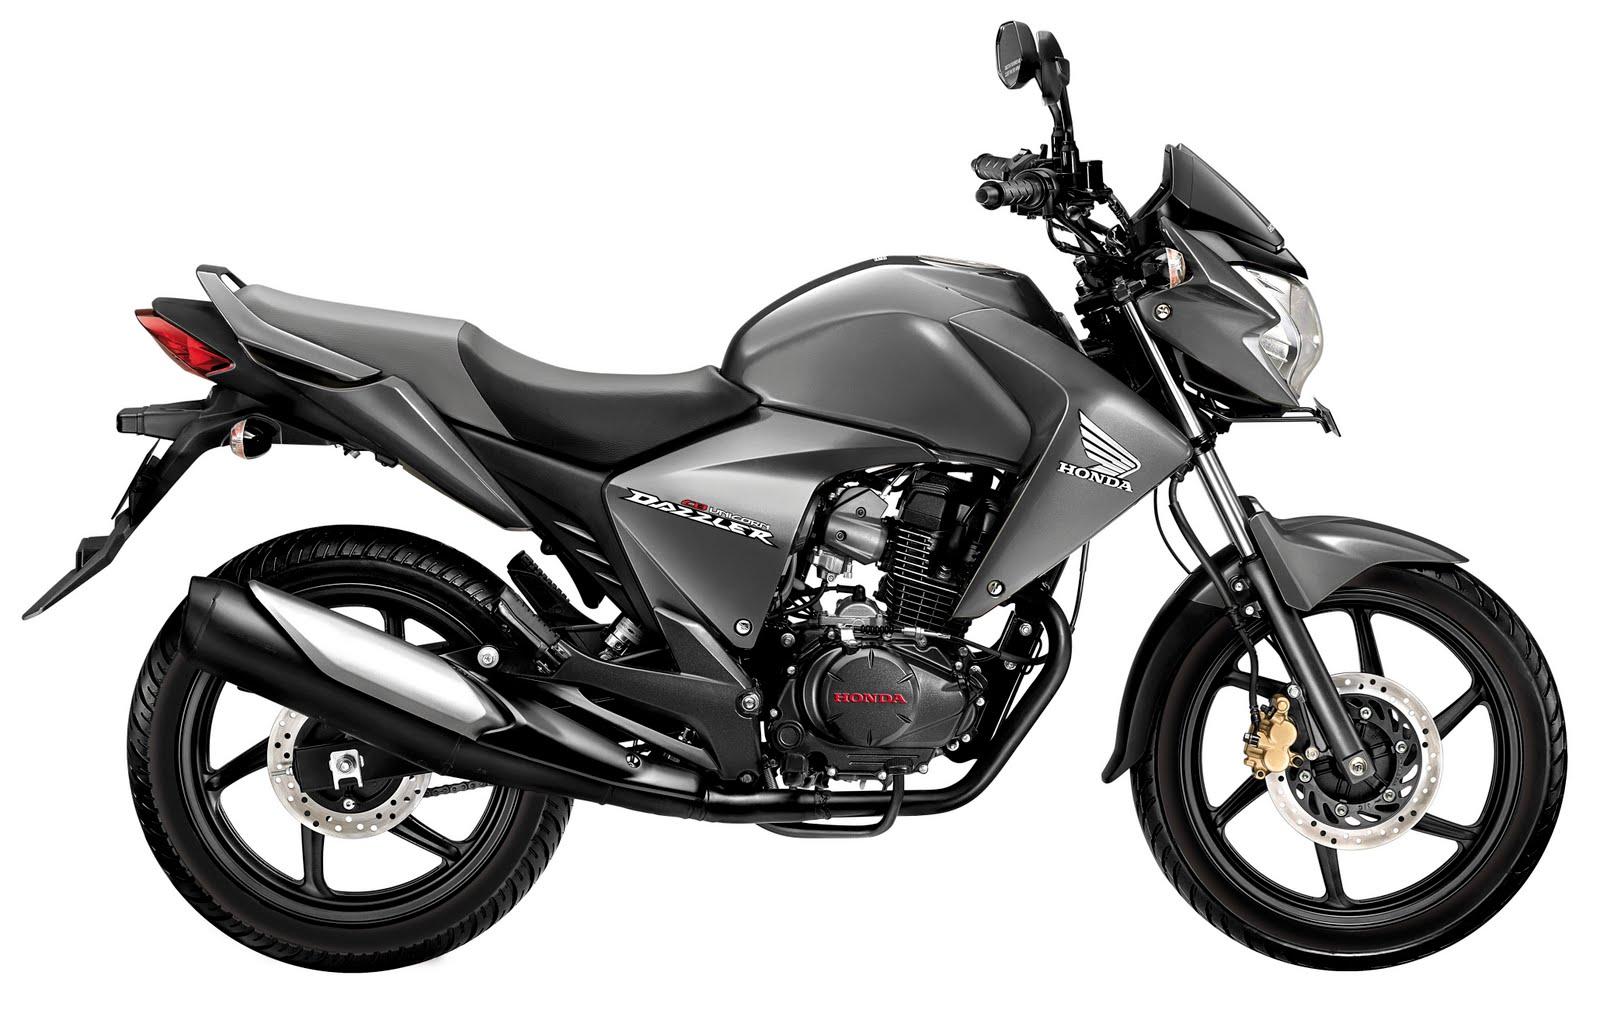 New Honda Unicorn CB Dazzler Price, review and ...